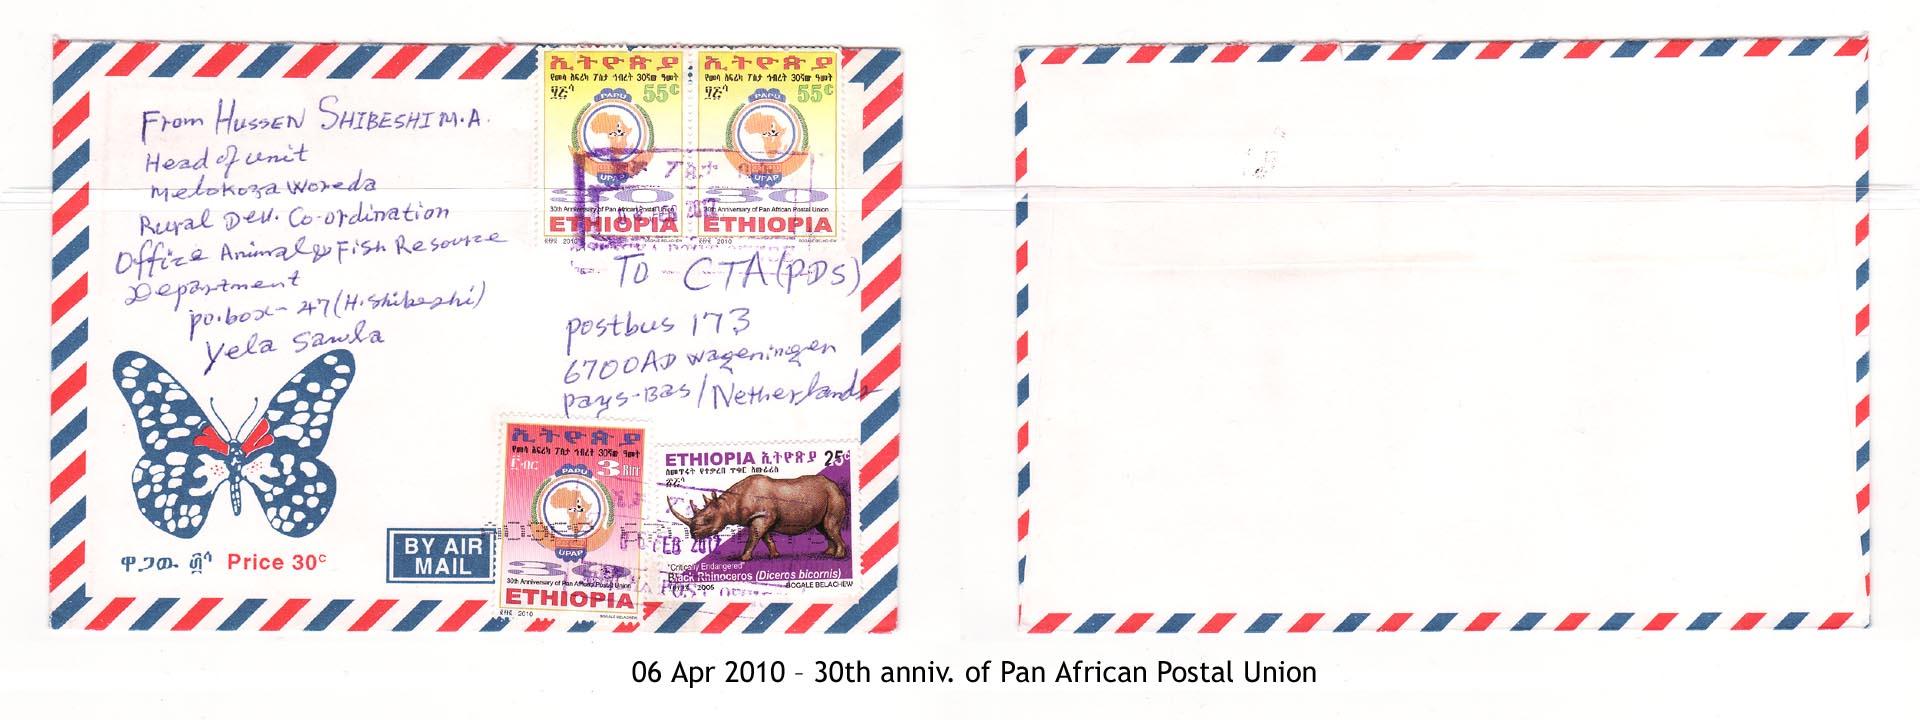 20100406 - 30th anniv. of Pan African Postal Union